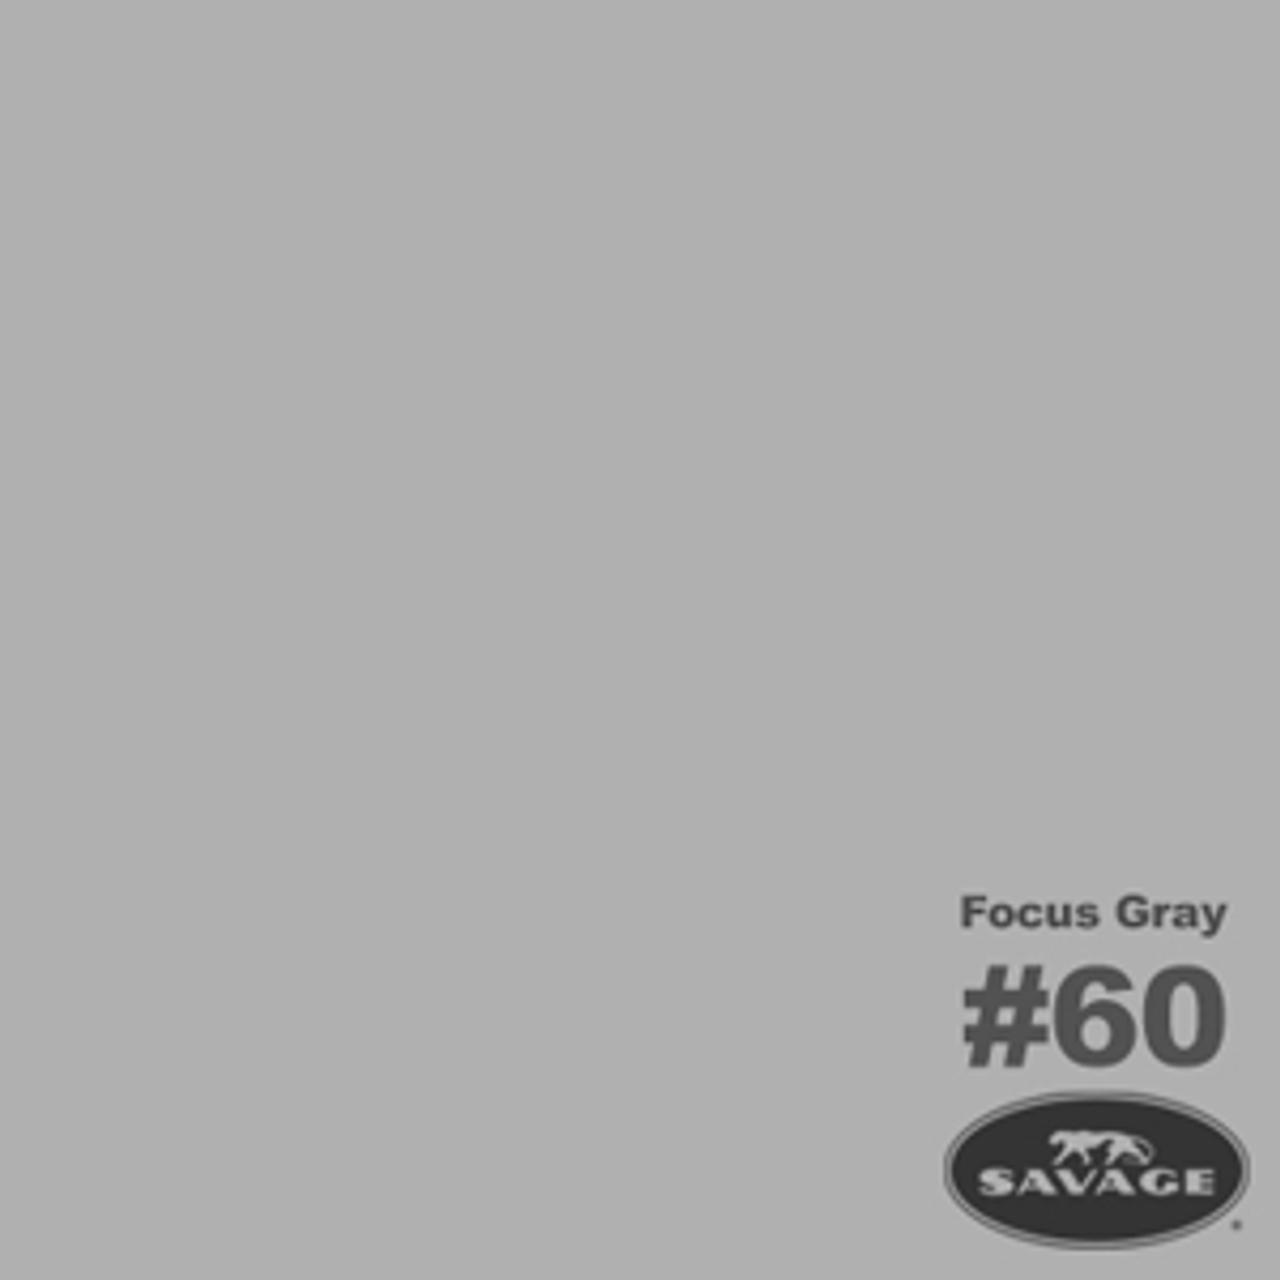 "Savage Background Paper 107"" x 12 yards Focus Gray"